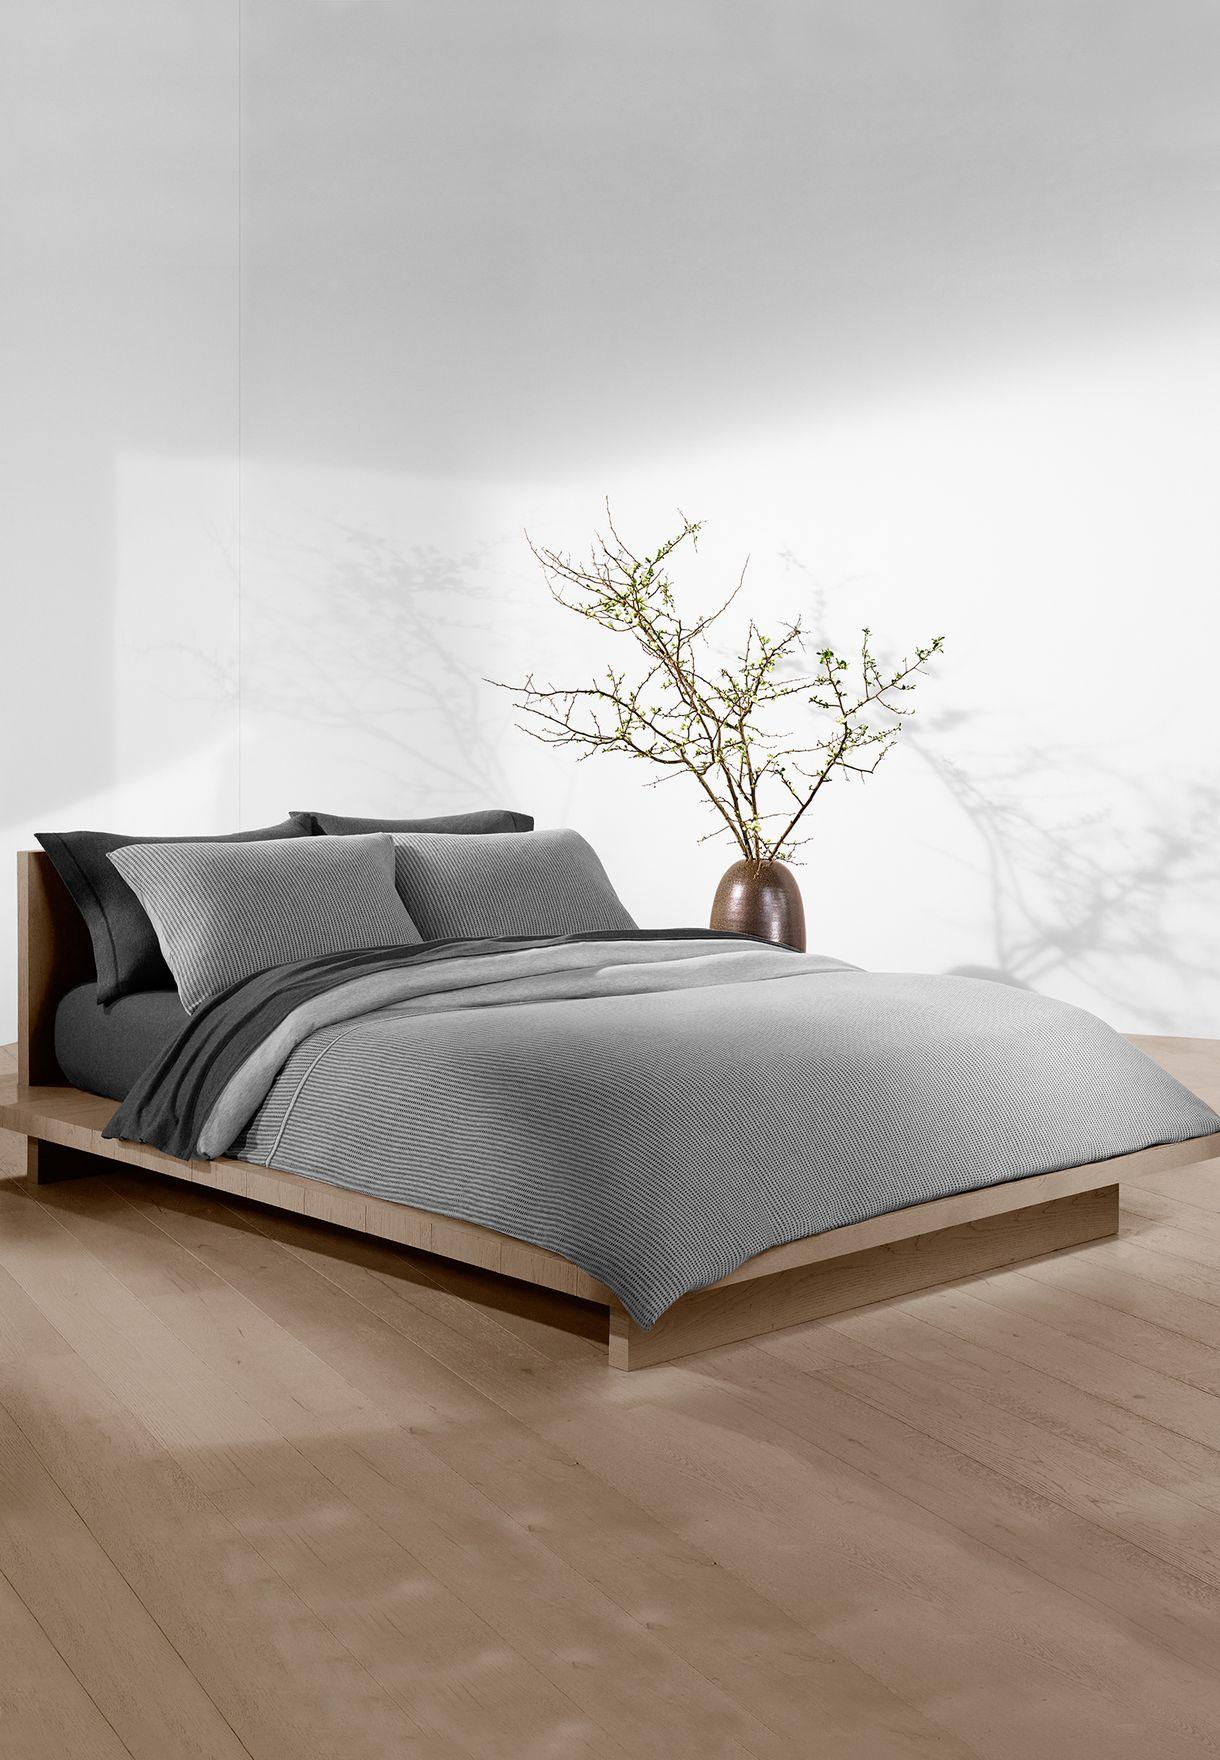 غطاء لحاف سوبر كينج جاريد- 240 × 260 سم